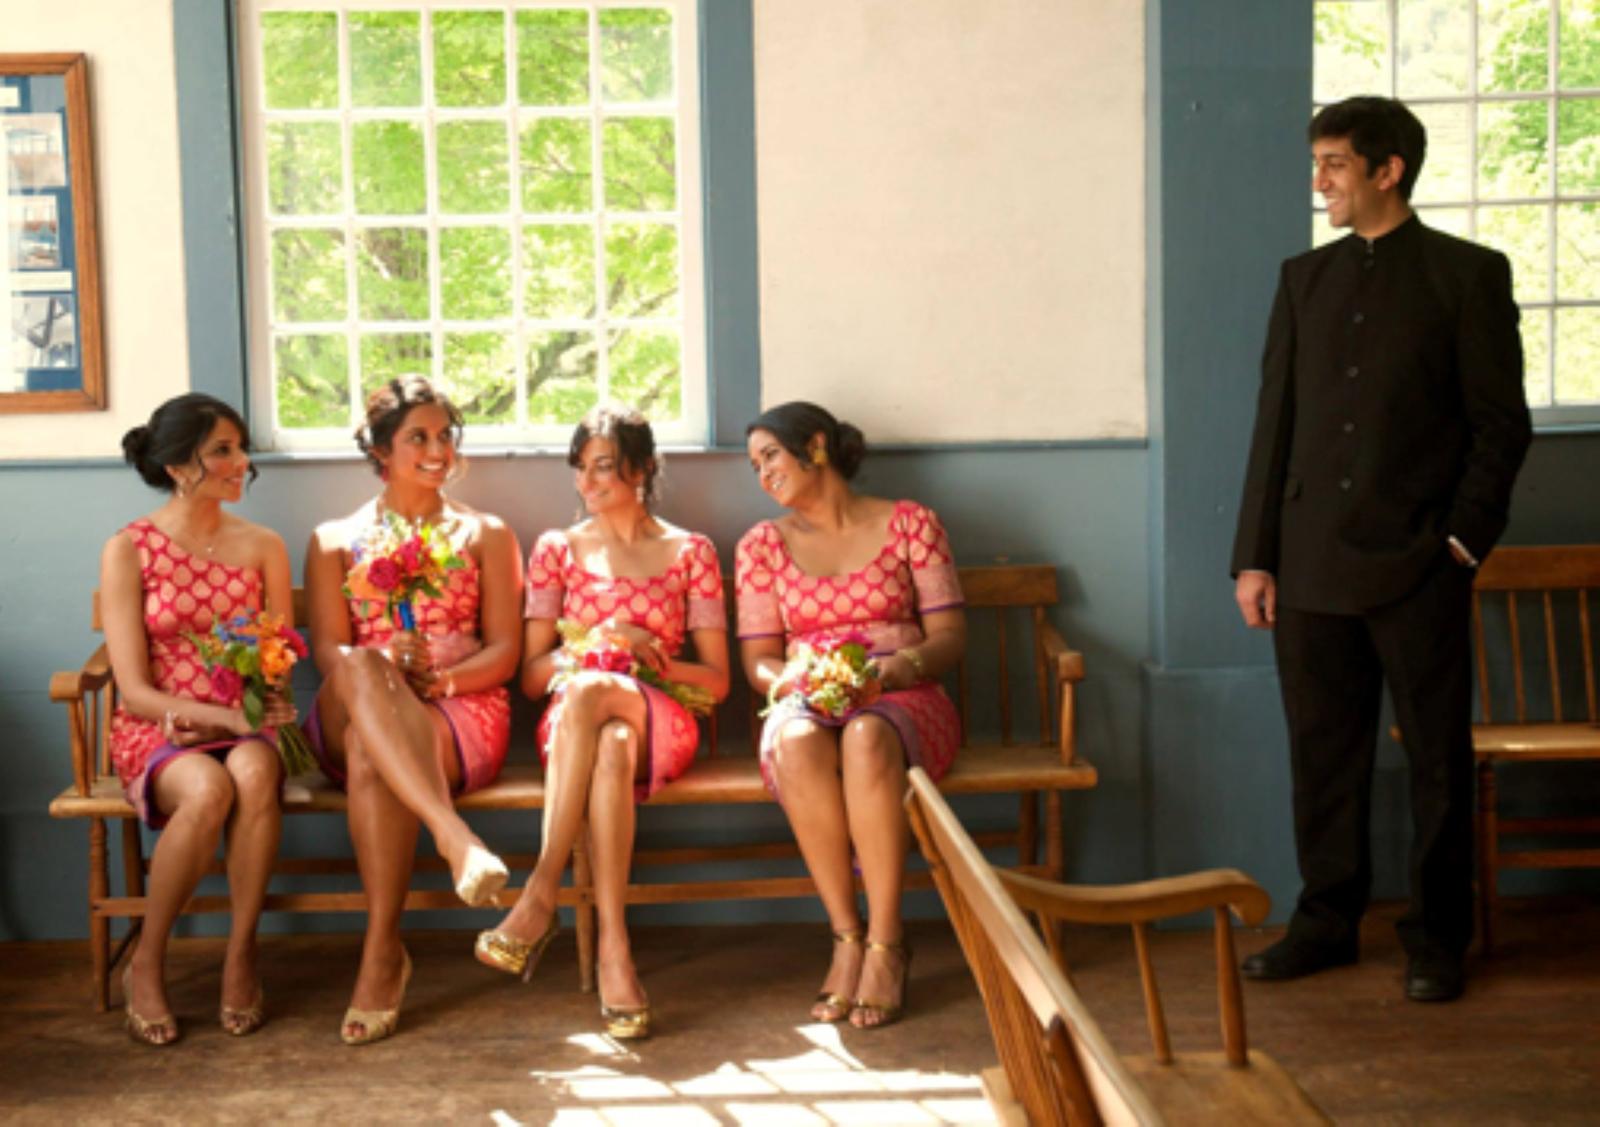 93- bridesmaids-dg 5x7.jpg